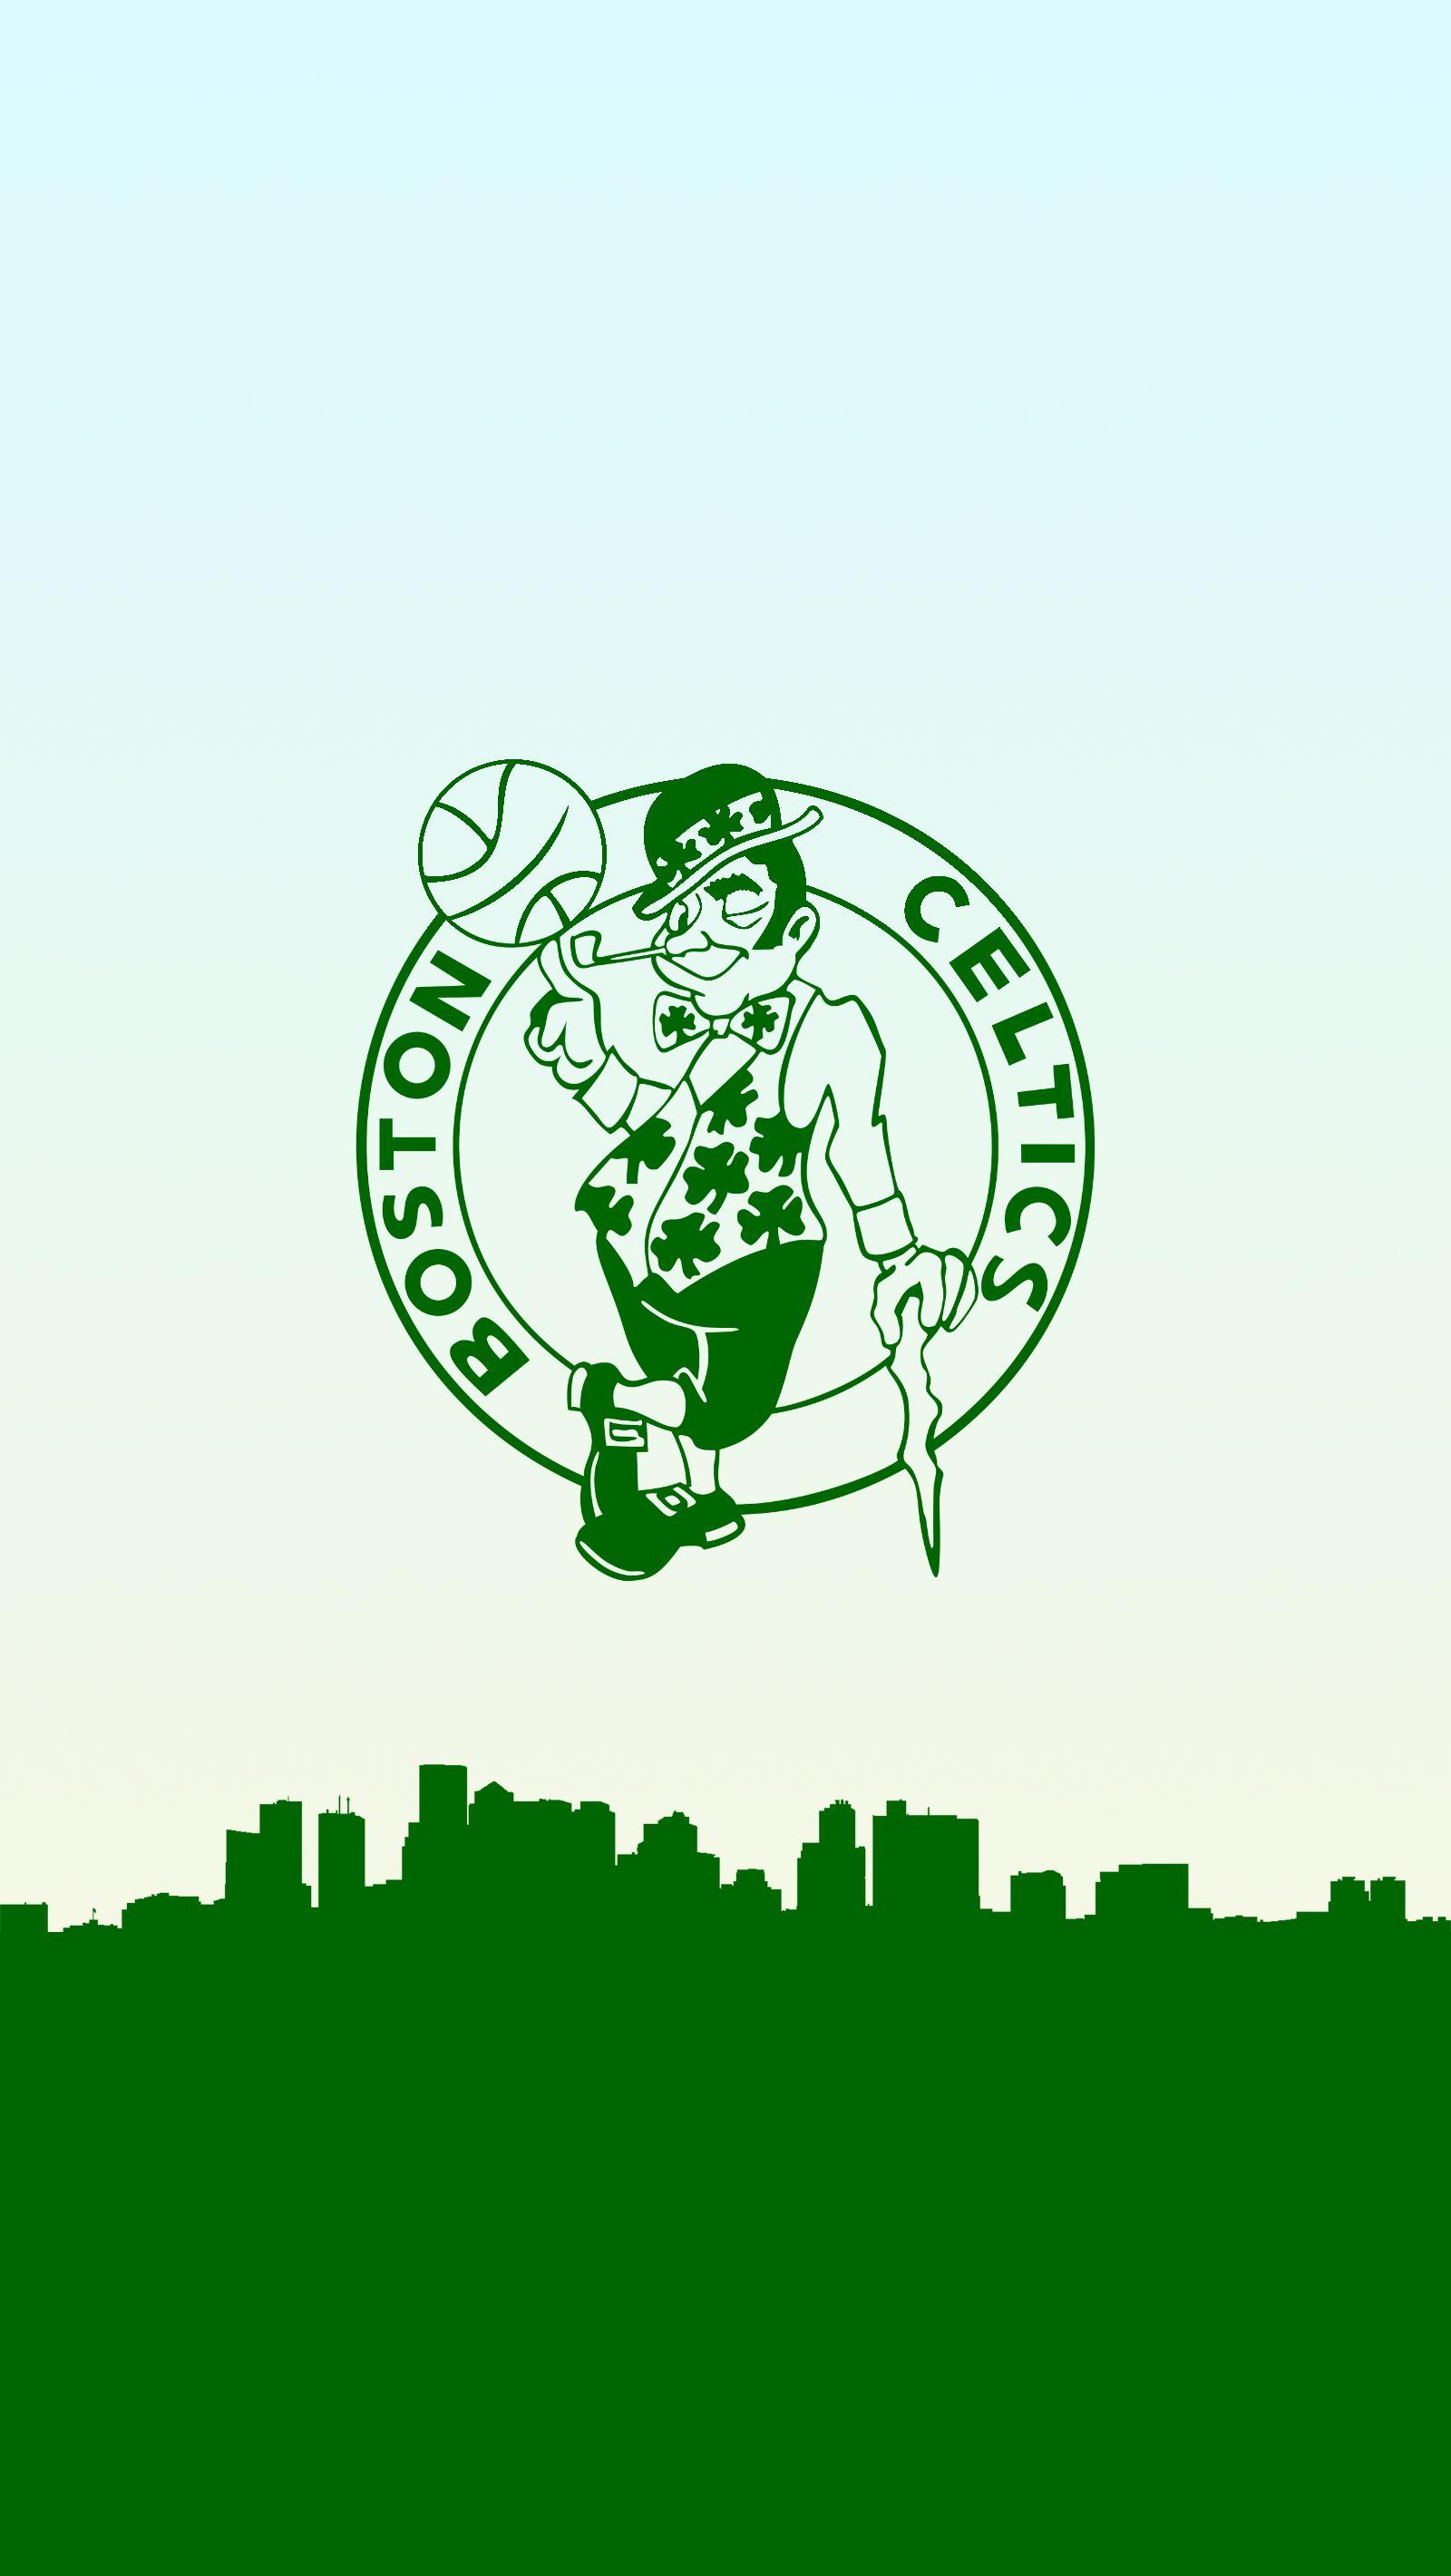 Boston Celtics Basketball Phone Background Boston Celtics Basketball Boston Celtics Wallpaper Celtics Basketball